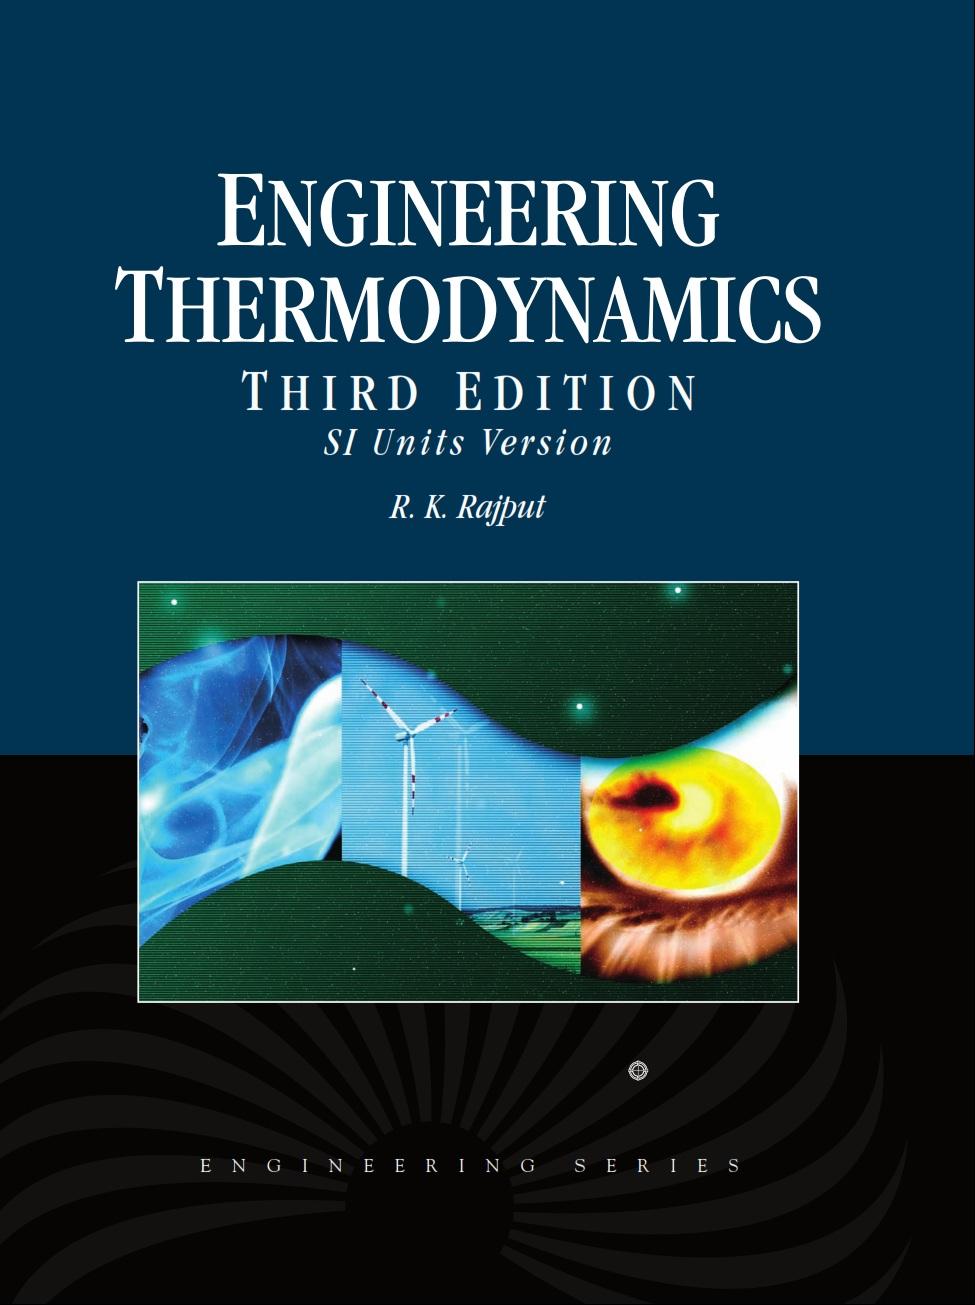 fundamentals of thermodynamics 6th edition pdf shapiro